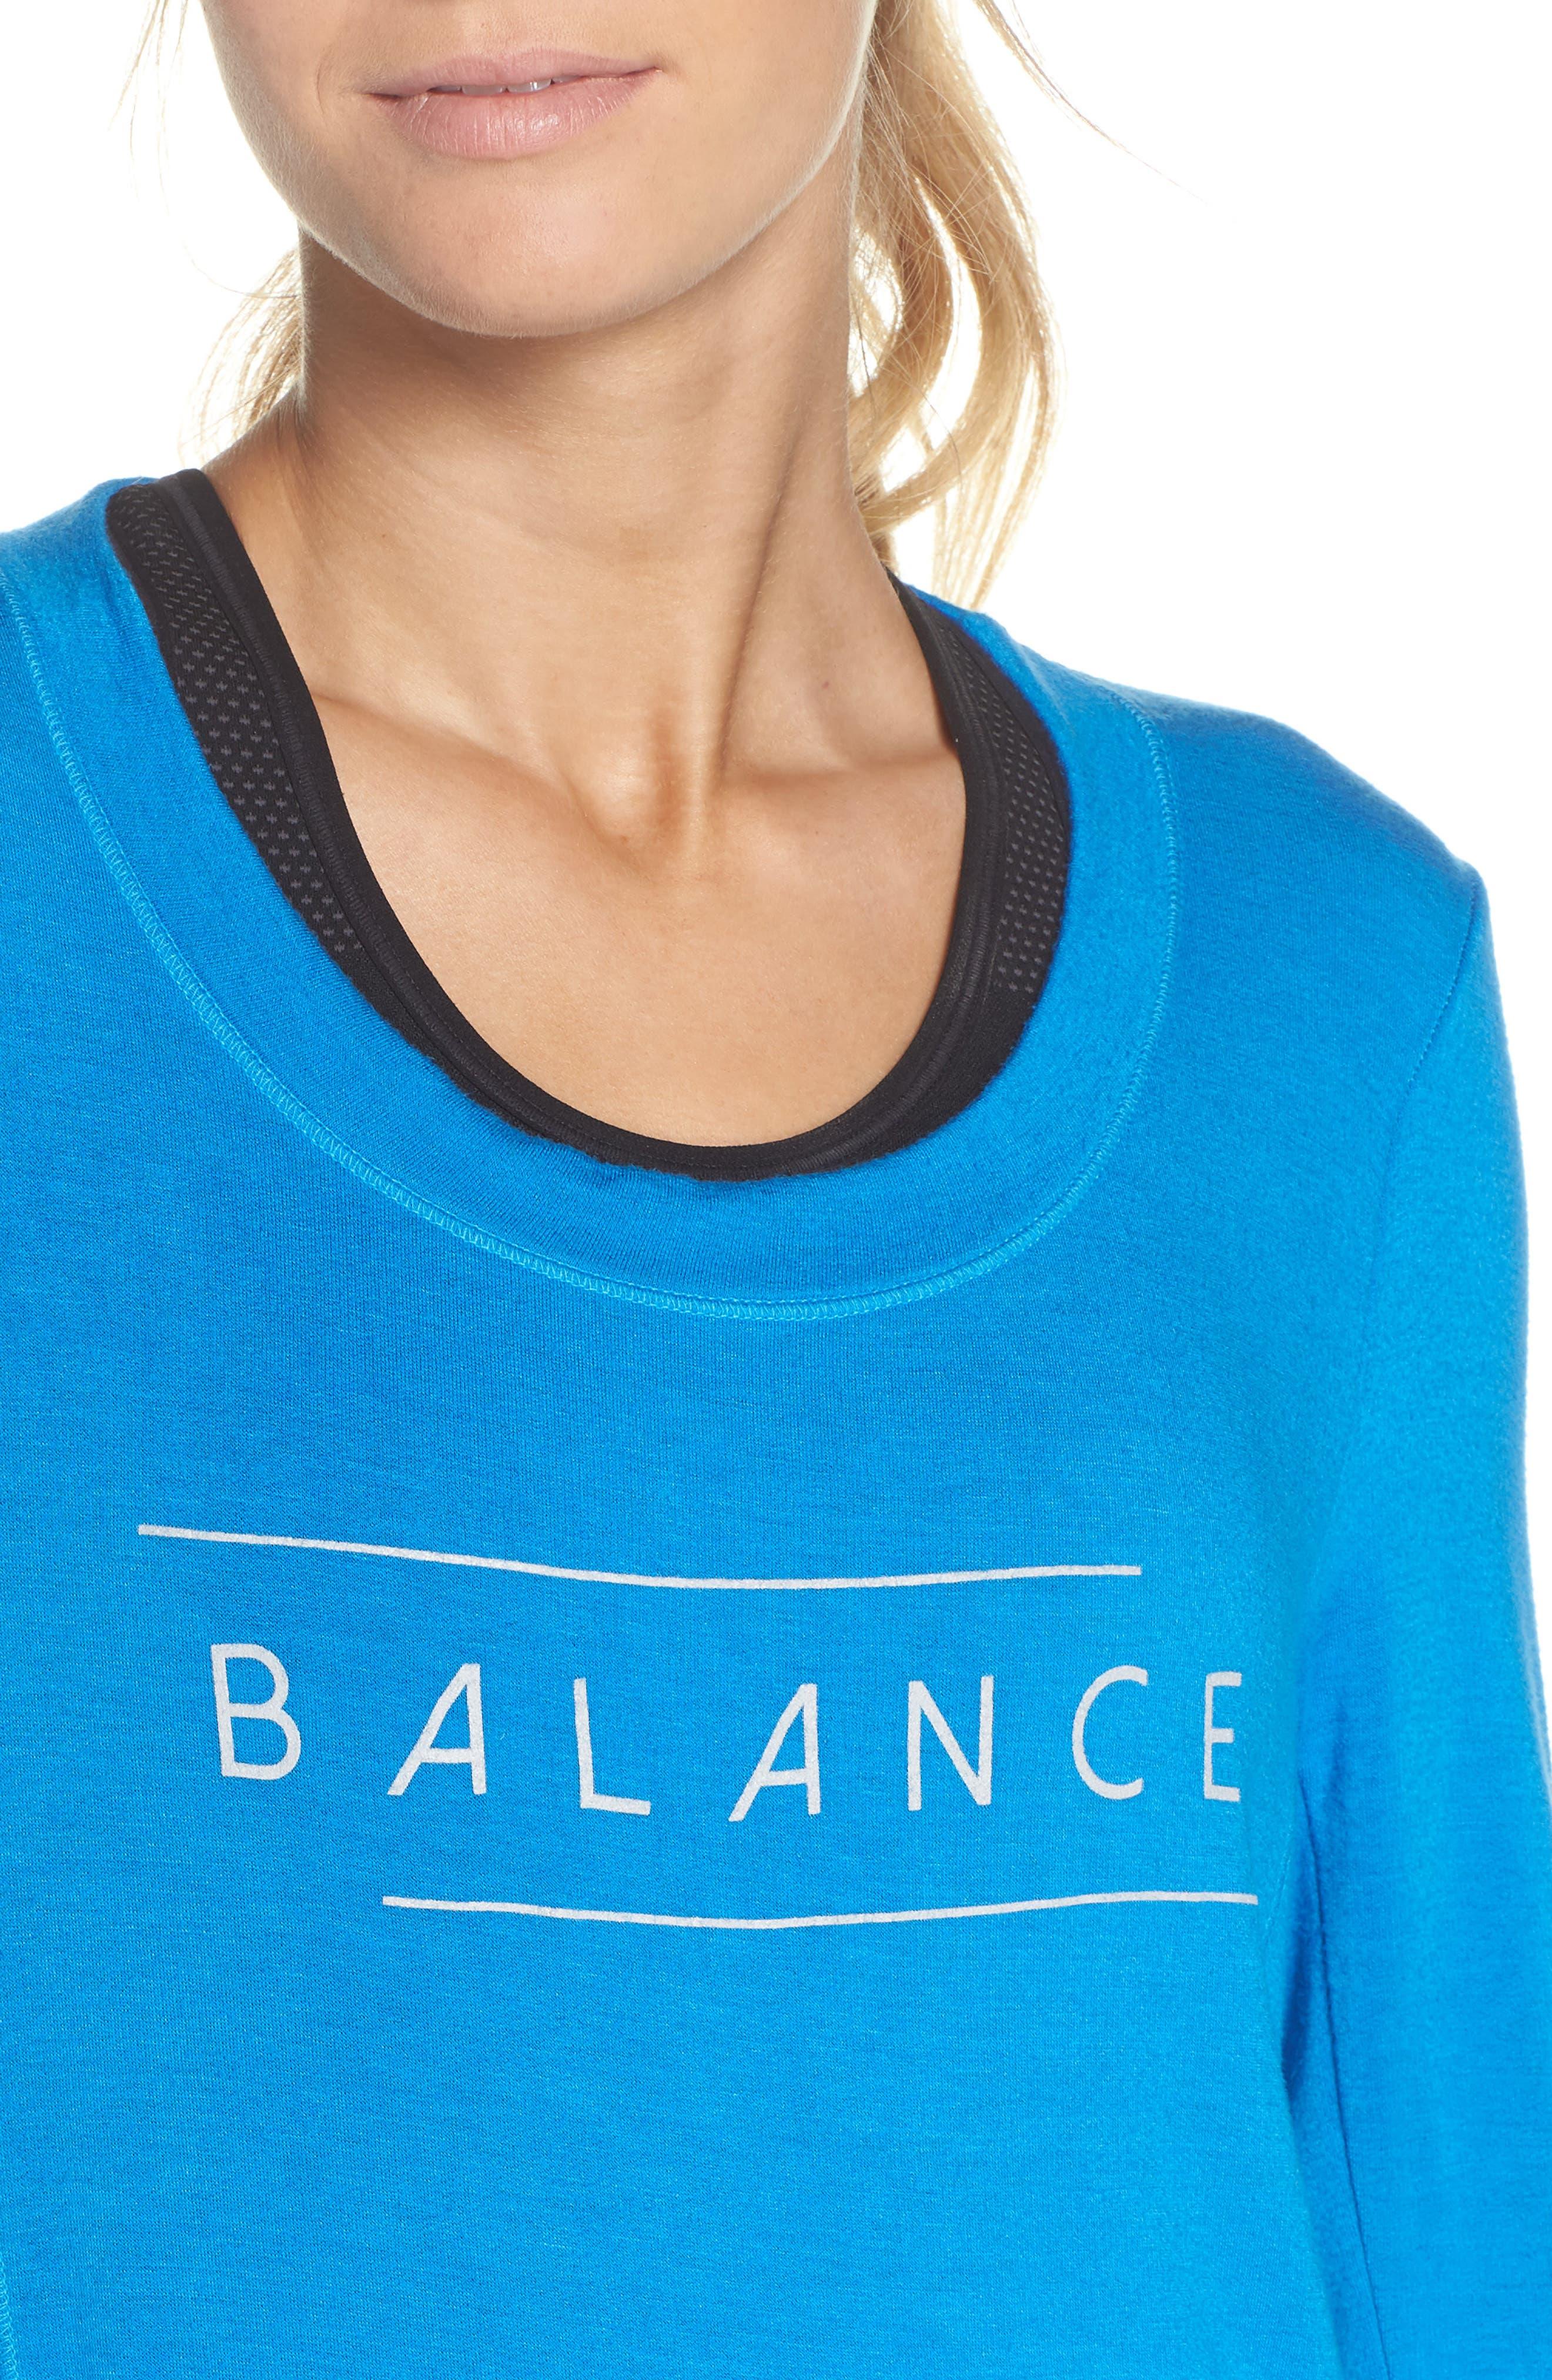 Jules Balance Sweatshirt,                             Alternate thumbnail 4, color,                             AZURE